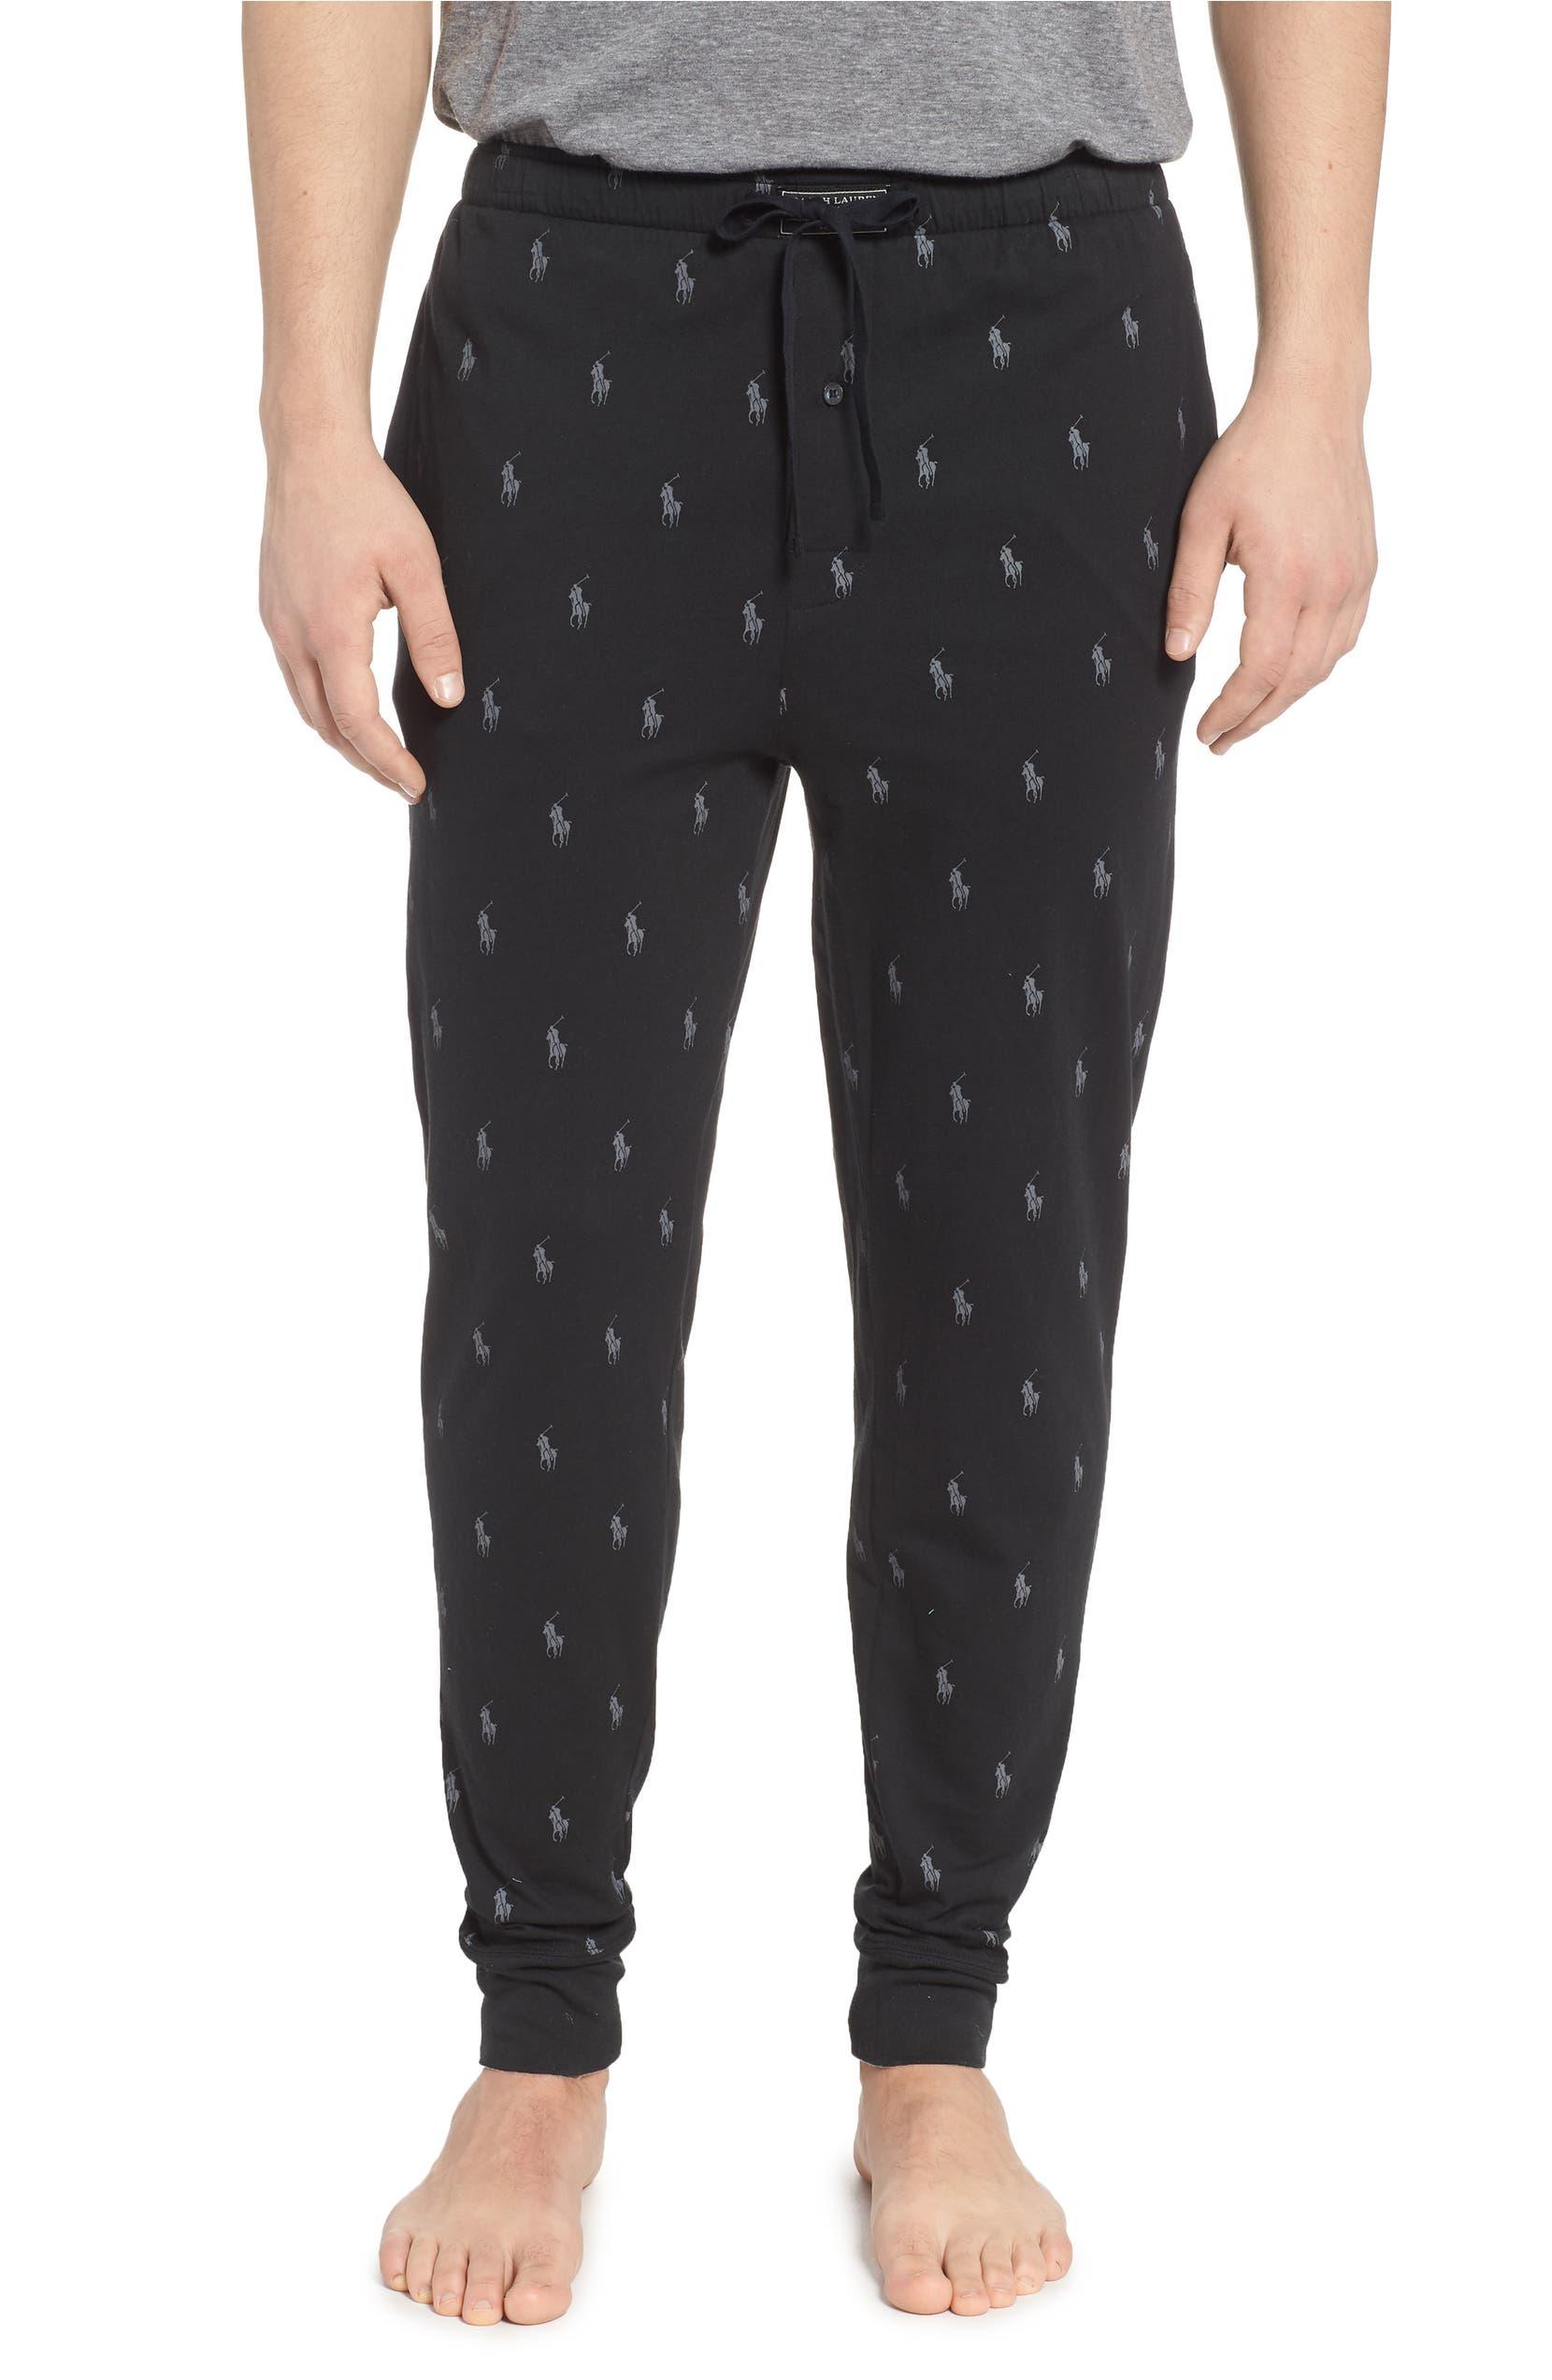 Pony Pony Pants Print Print Pony Pajama Pants Pajama eWIYEDH92